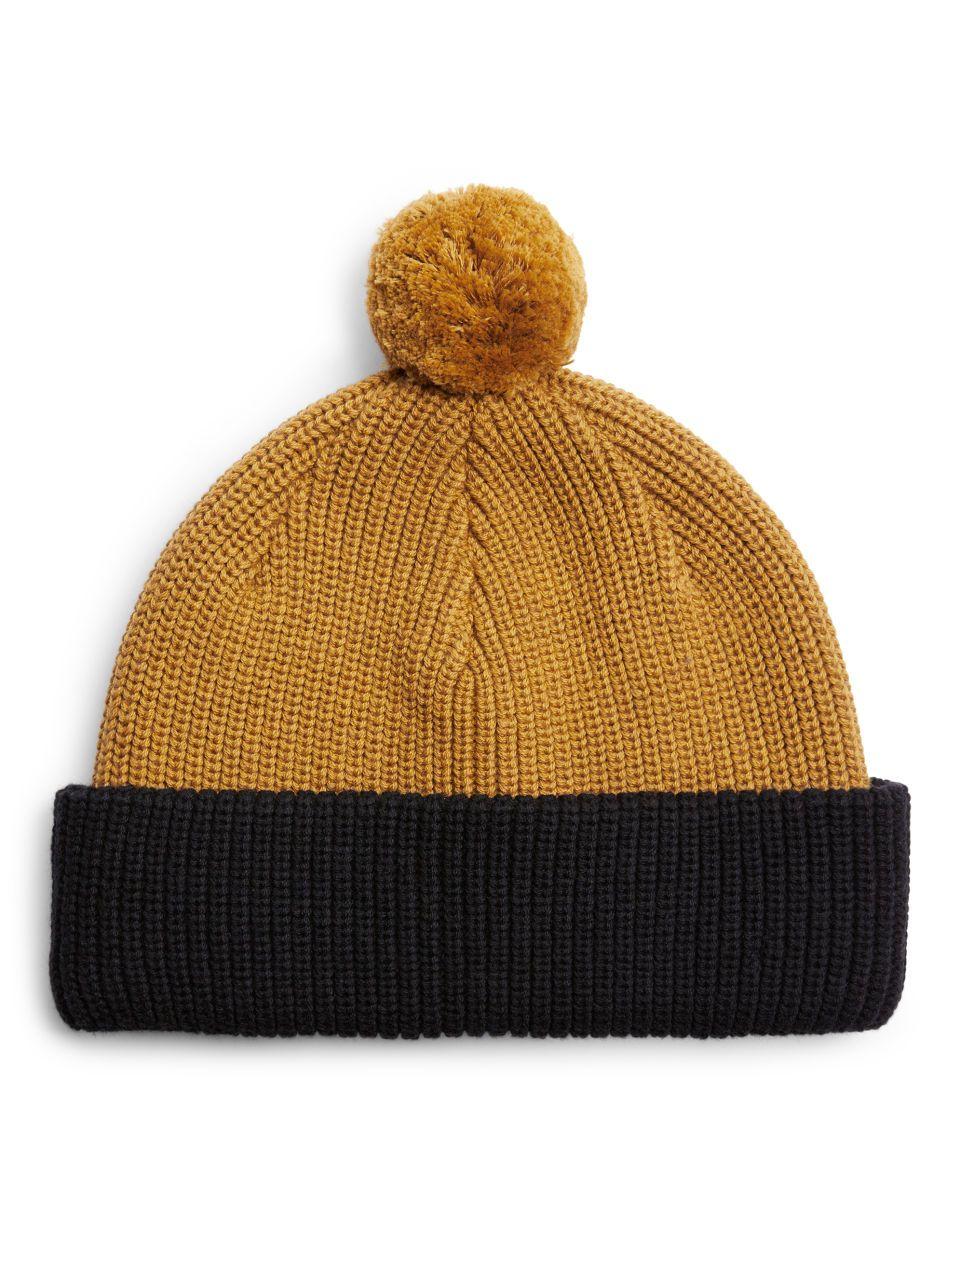 Merino Cotton Chunky Beanie - Dark Yellow Blue - Bags   accessories - ARKET  IE 3643acfa9f4